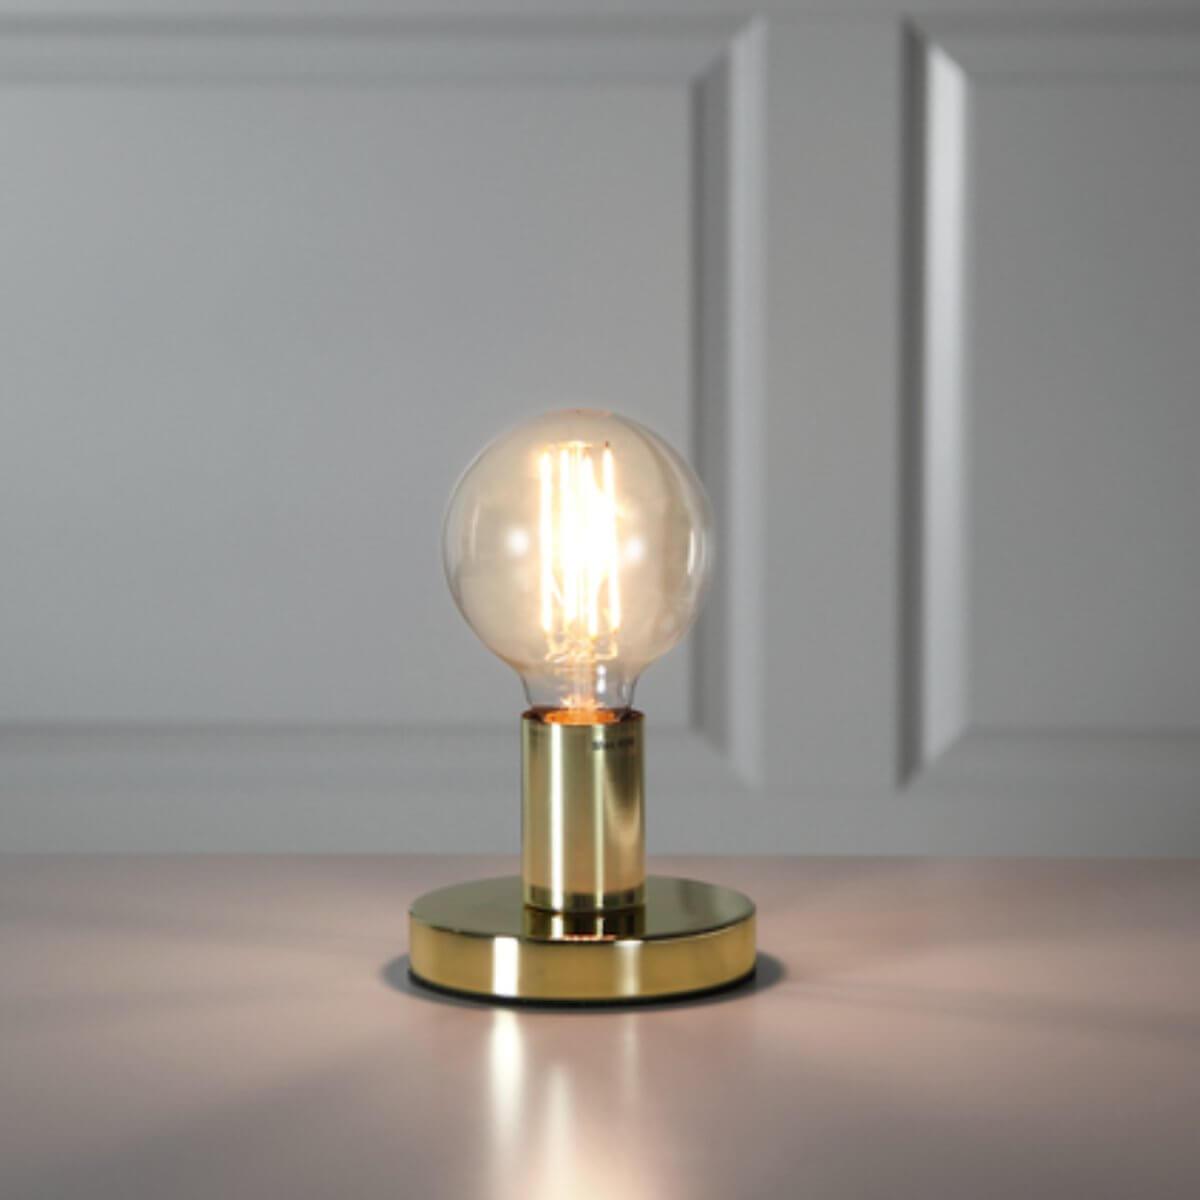 Leuchte mit goldenem Sockel